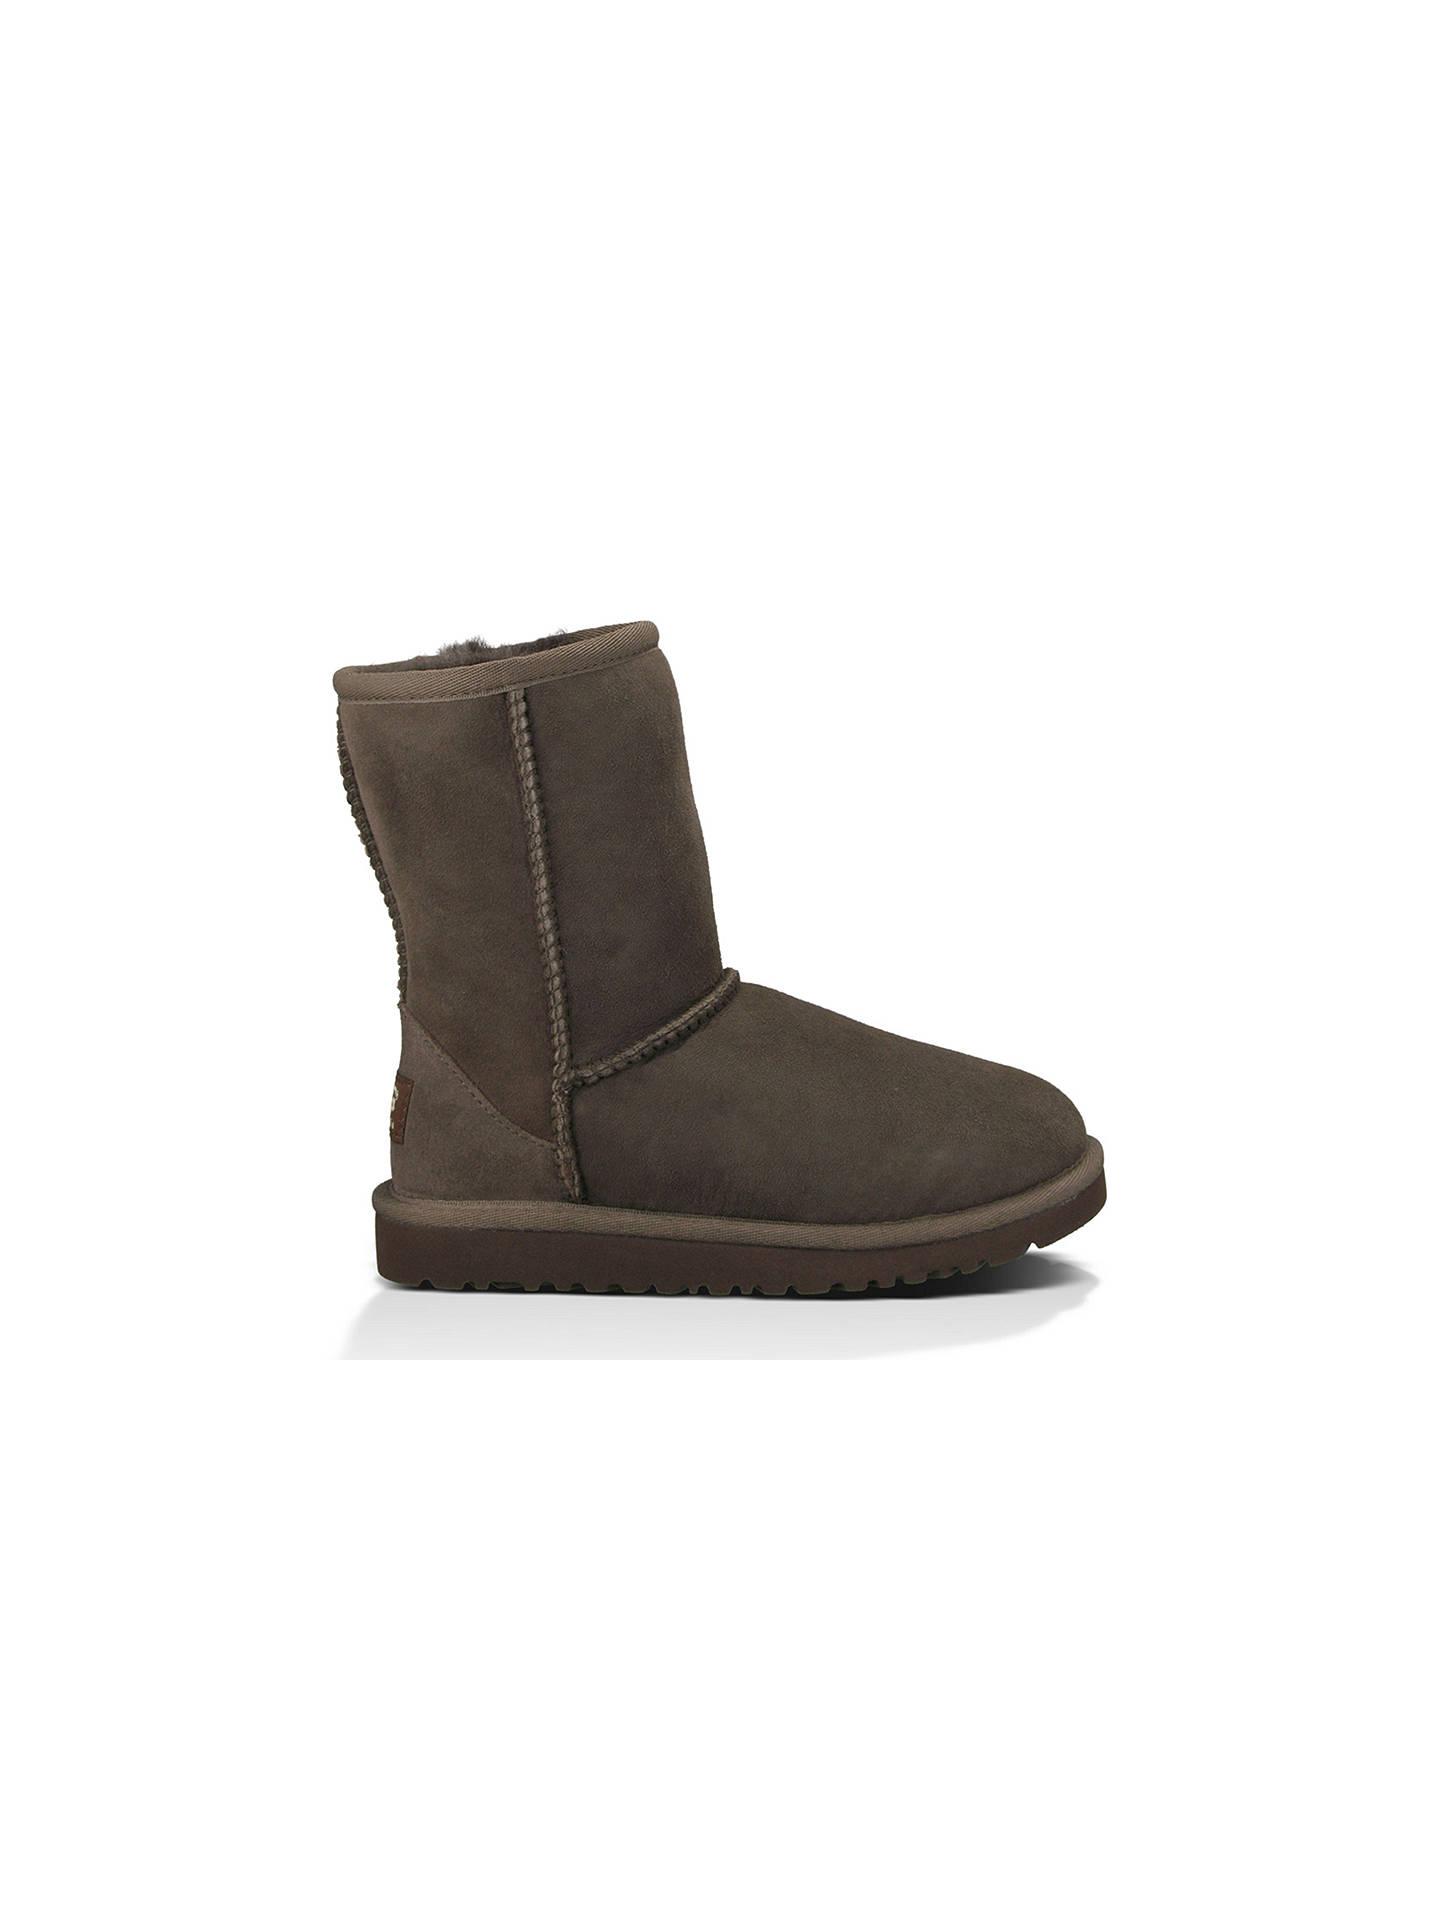 f2deefb1789 UGG Children's Classic Short Sheepskin Boots at John Lewis & Partners